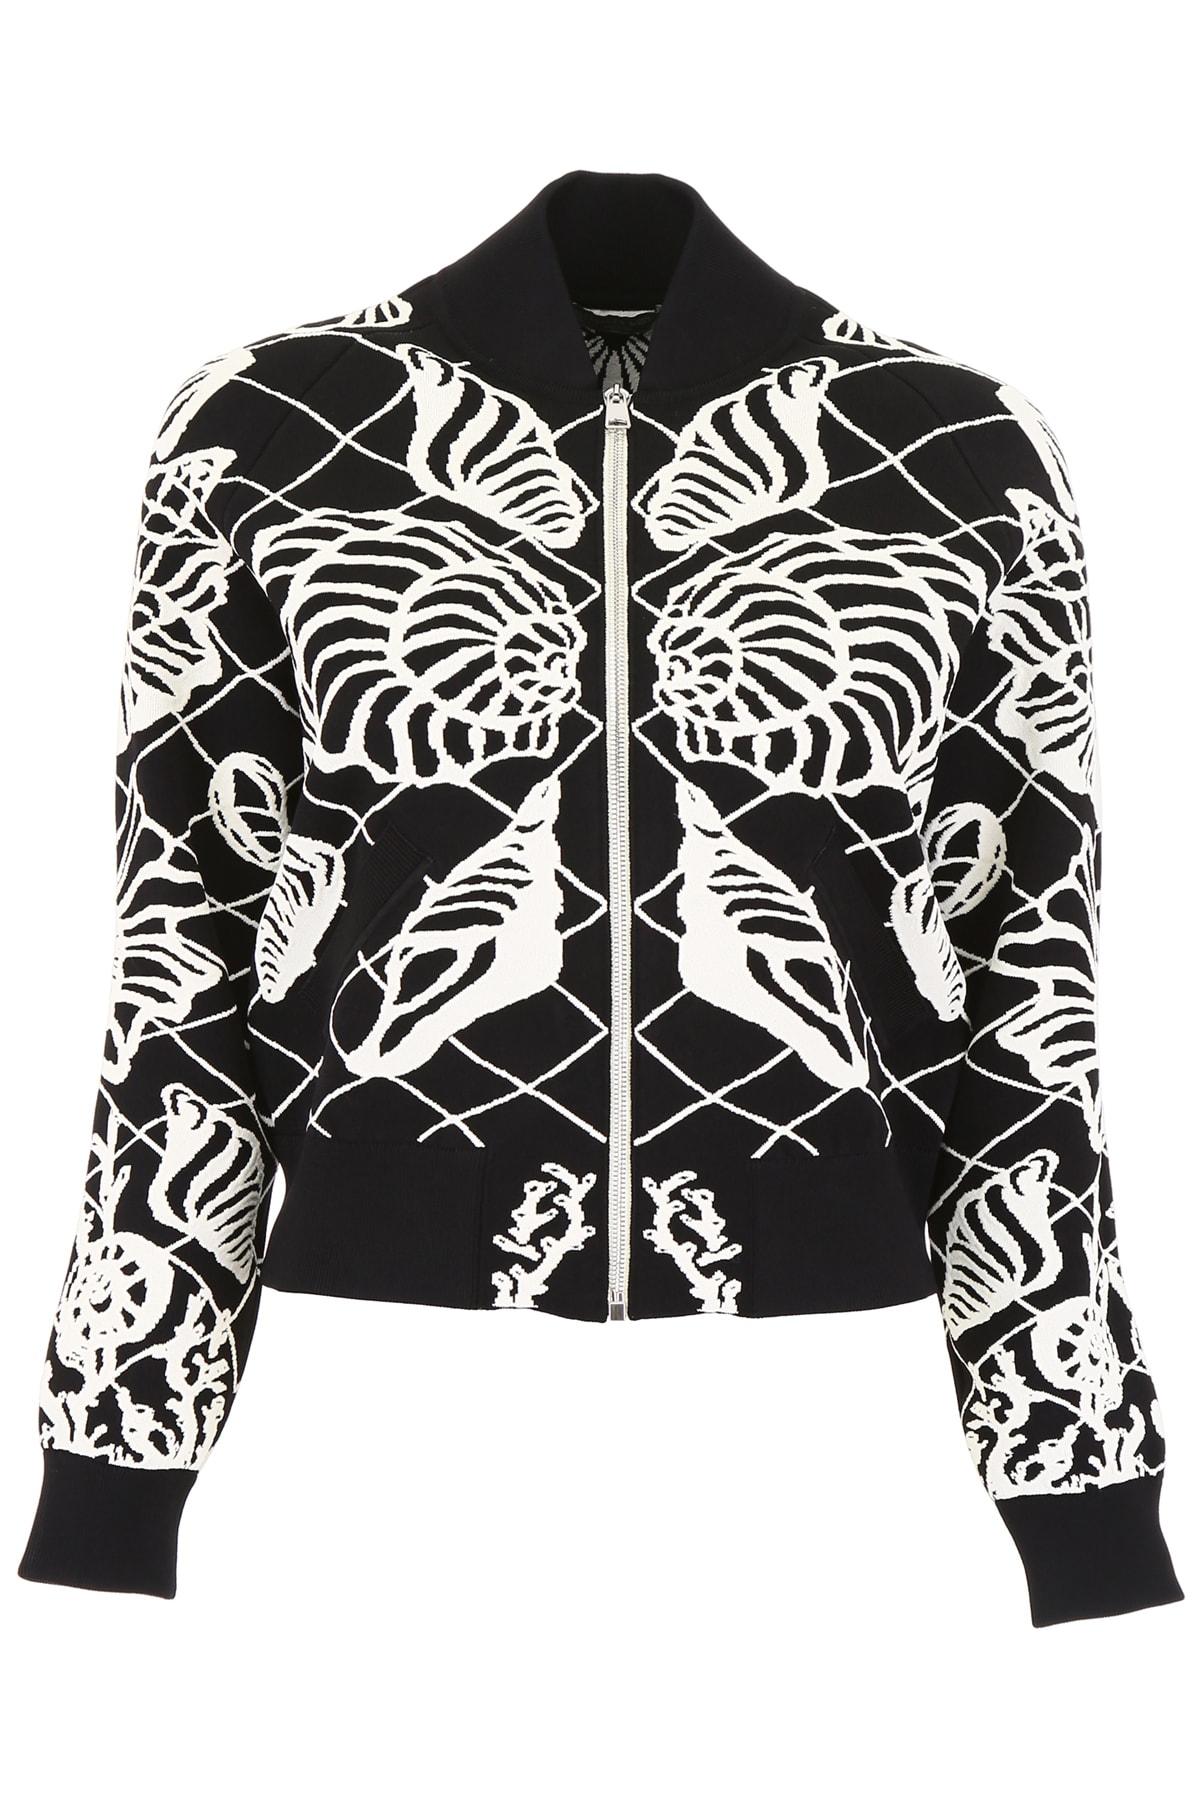 Alexander McQueen Knit Bomber Jacket